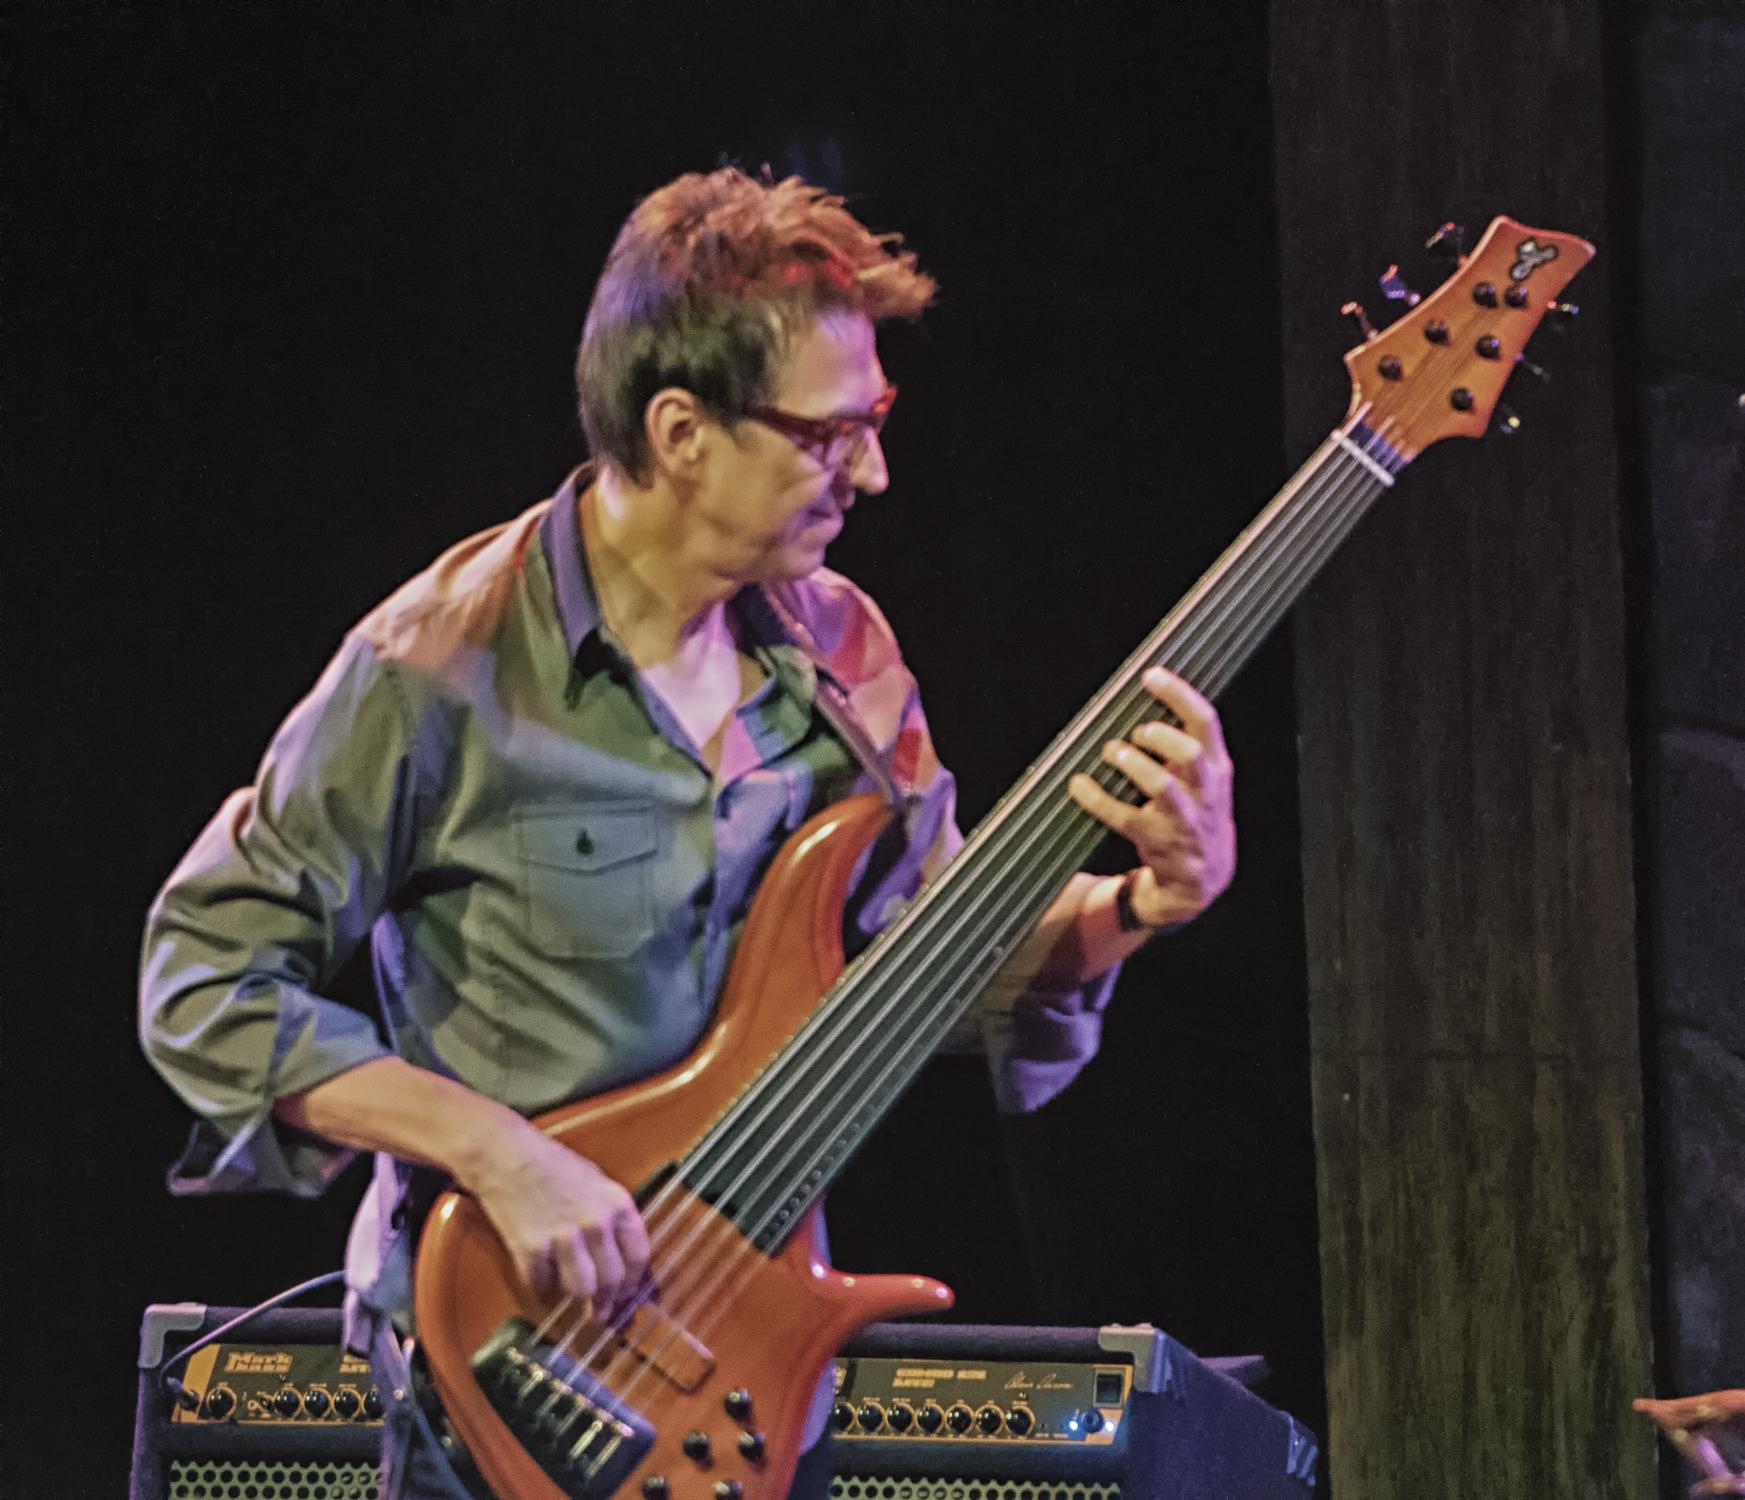 Alain caron at the montreal international jazz festival 2013